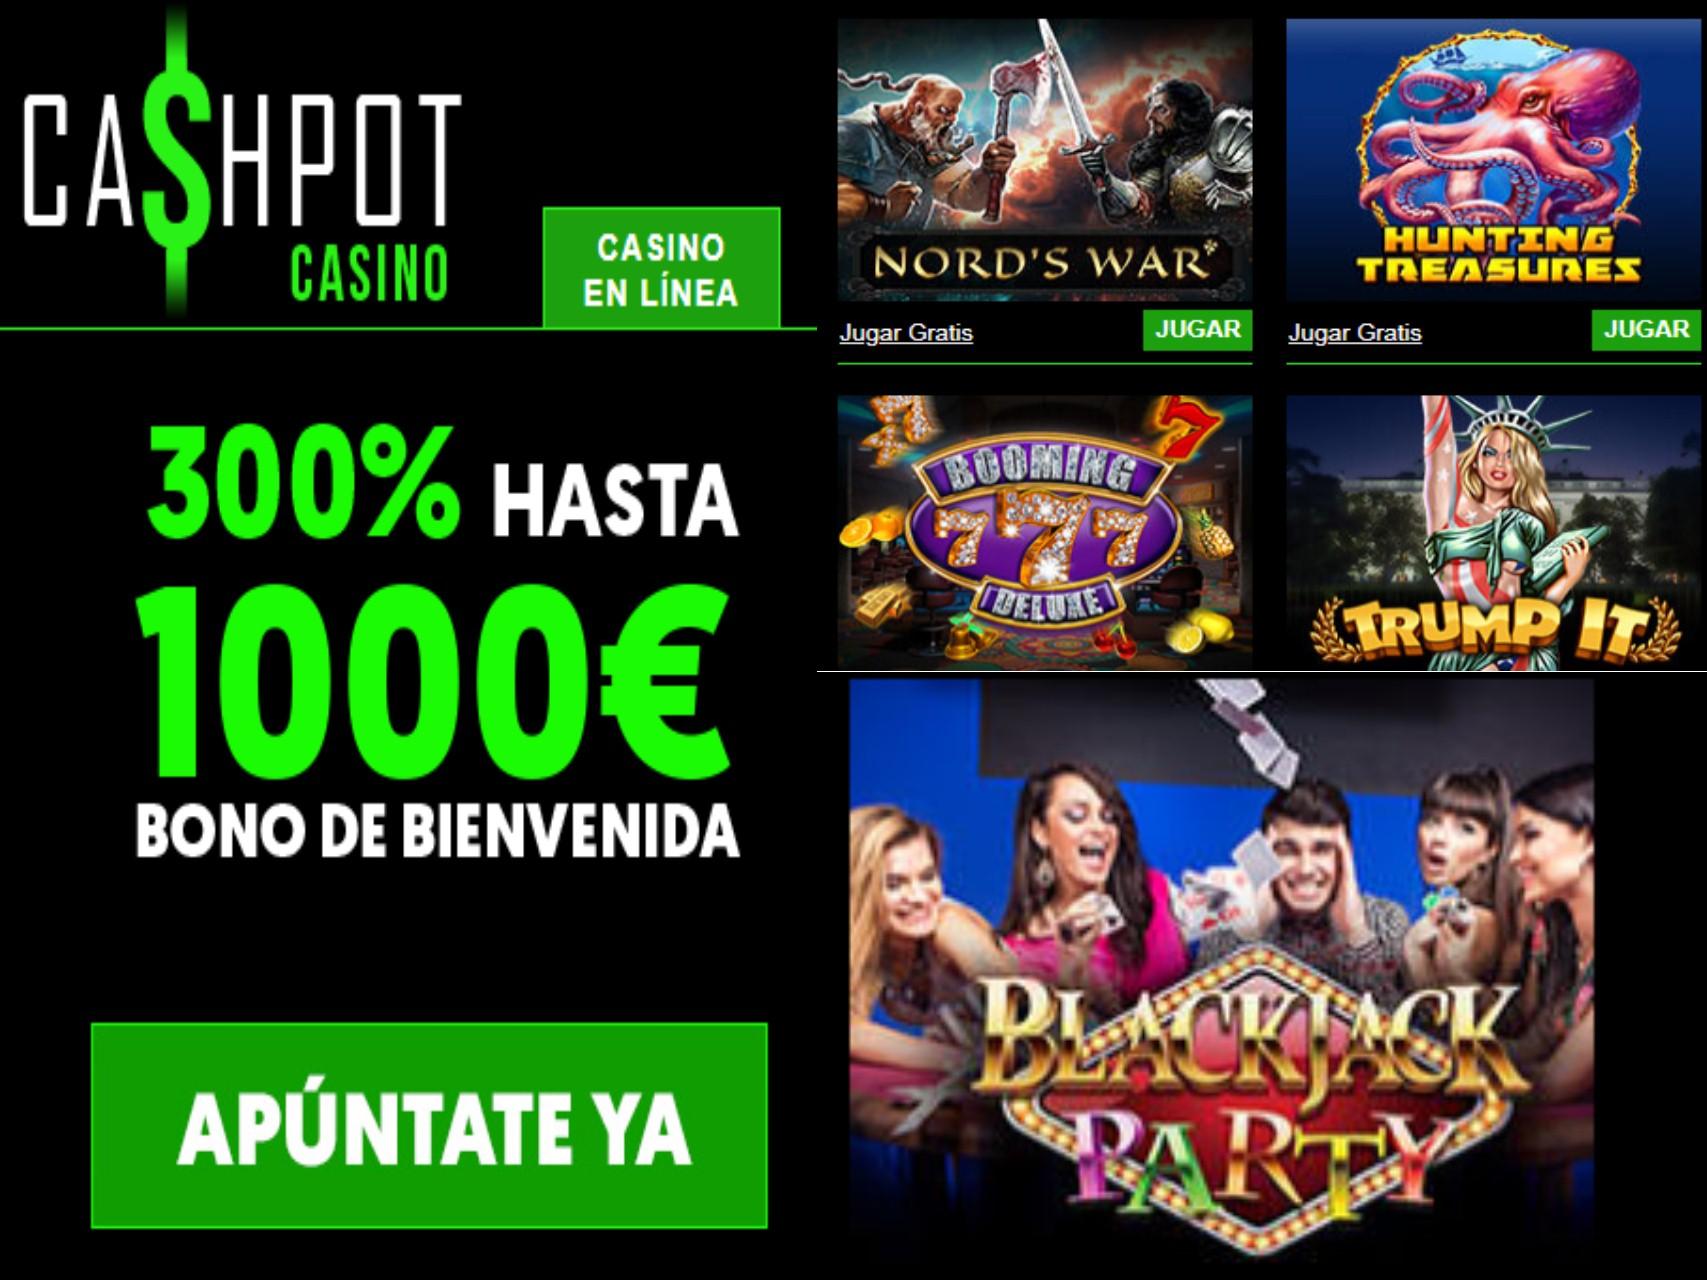 Consiga 1000 euros sobre el primer ingreso en Casino Cashpot